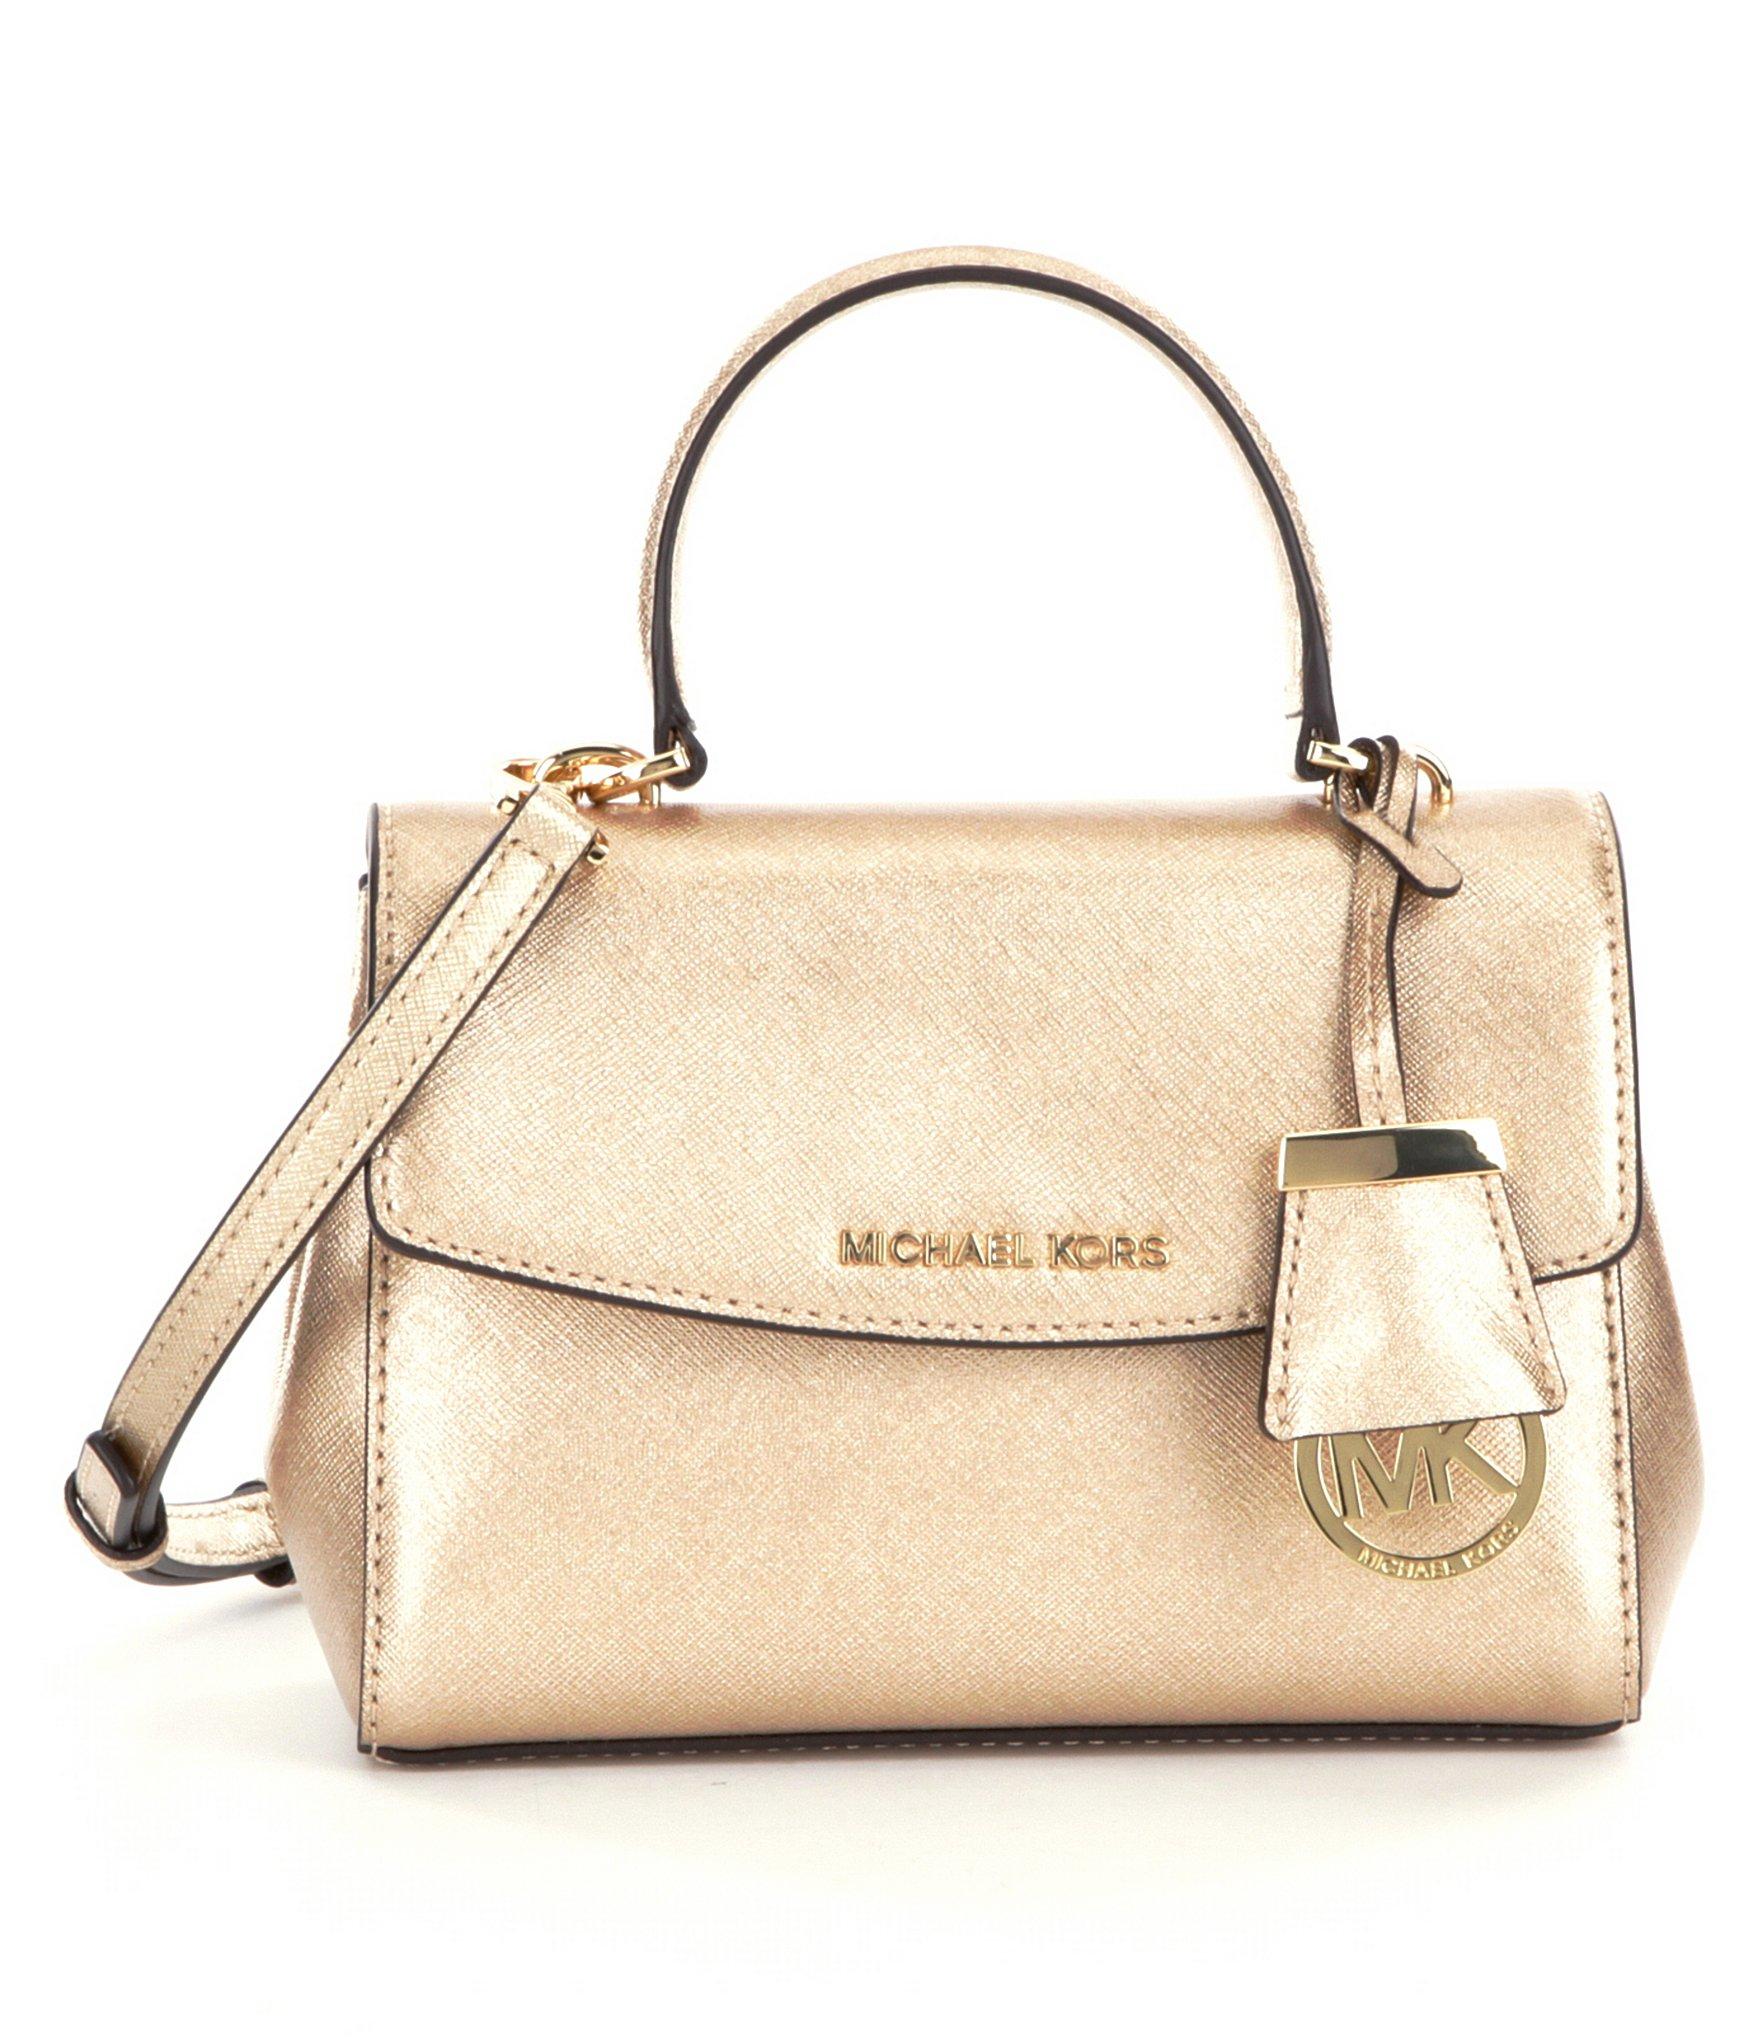 4b92fea4023962 MICHAEL Michael Kors Ava Xs Metallic Cross-body Bag in Metallic - Lyst